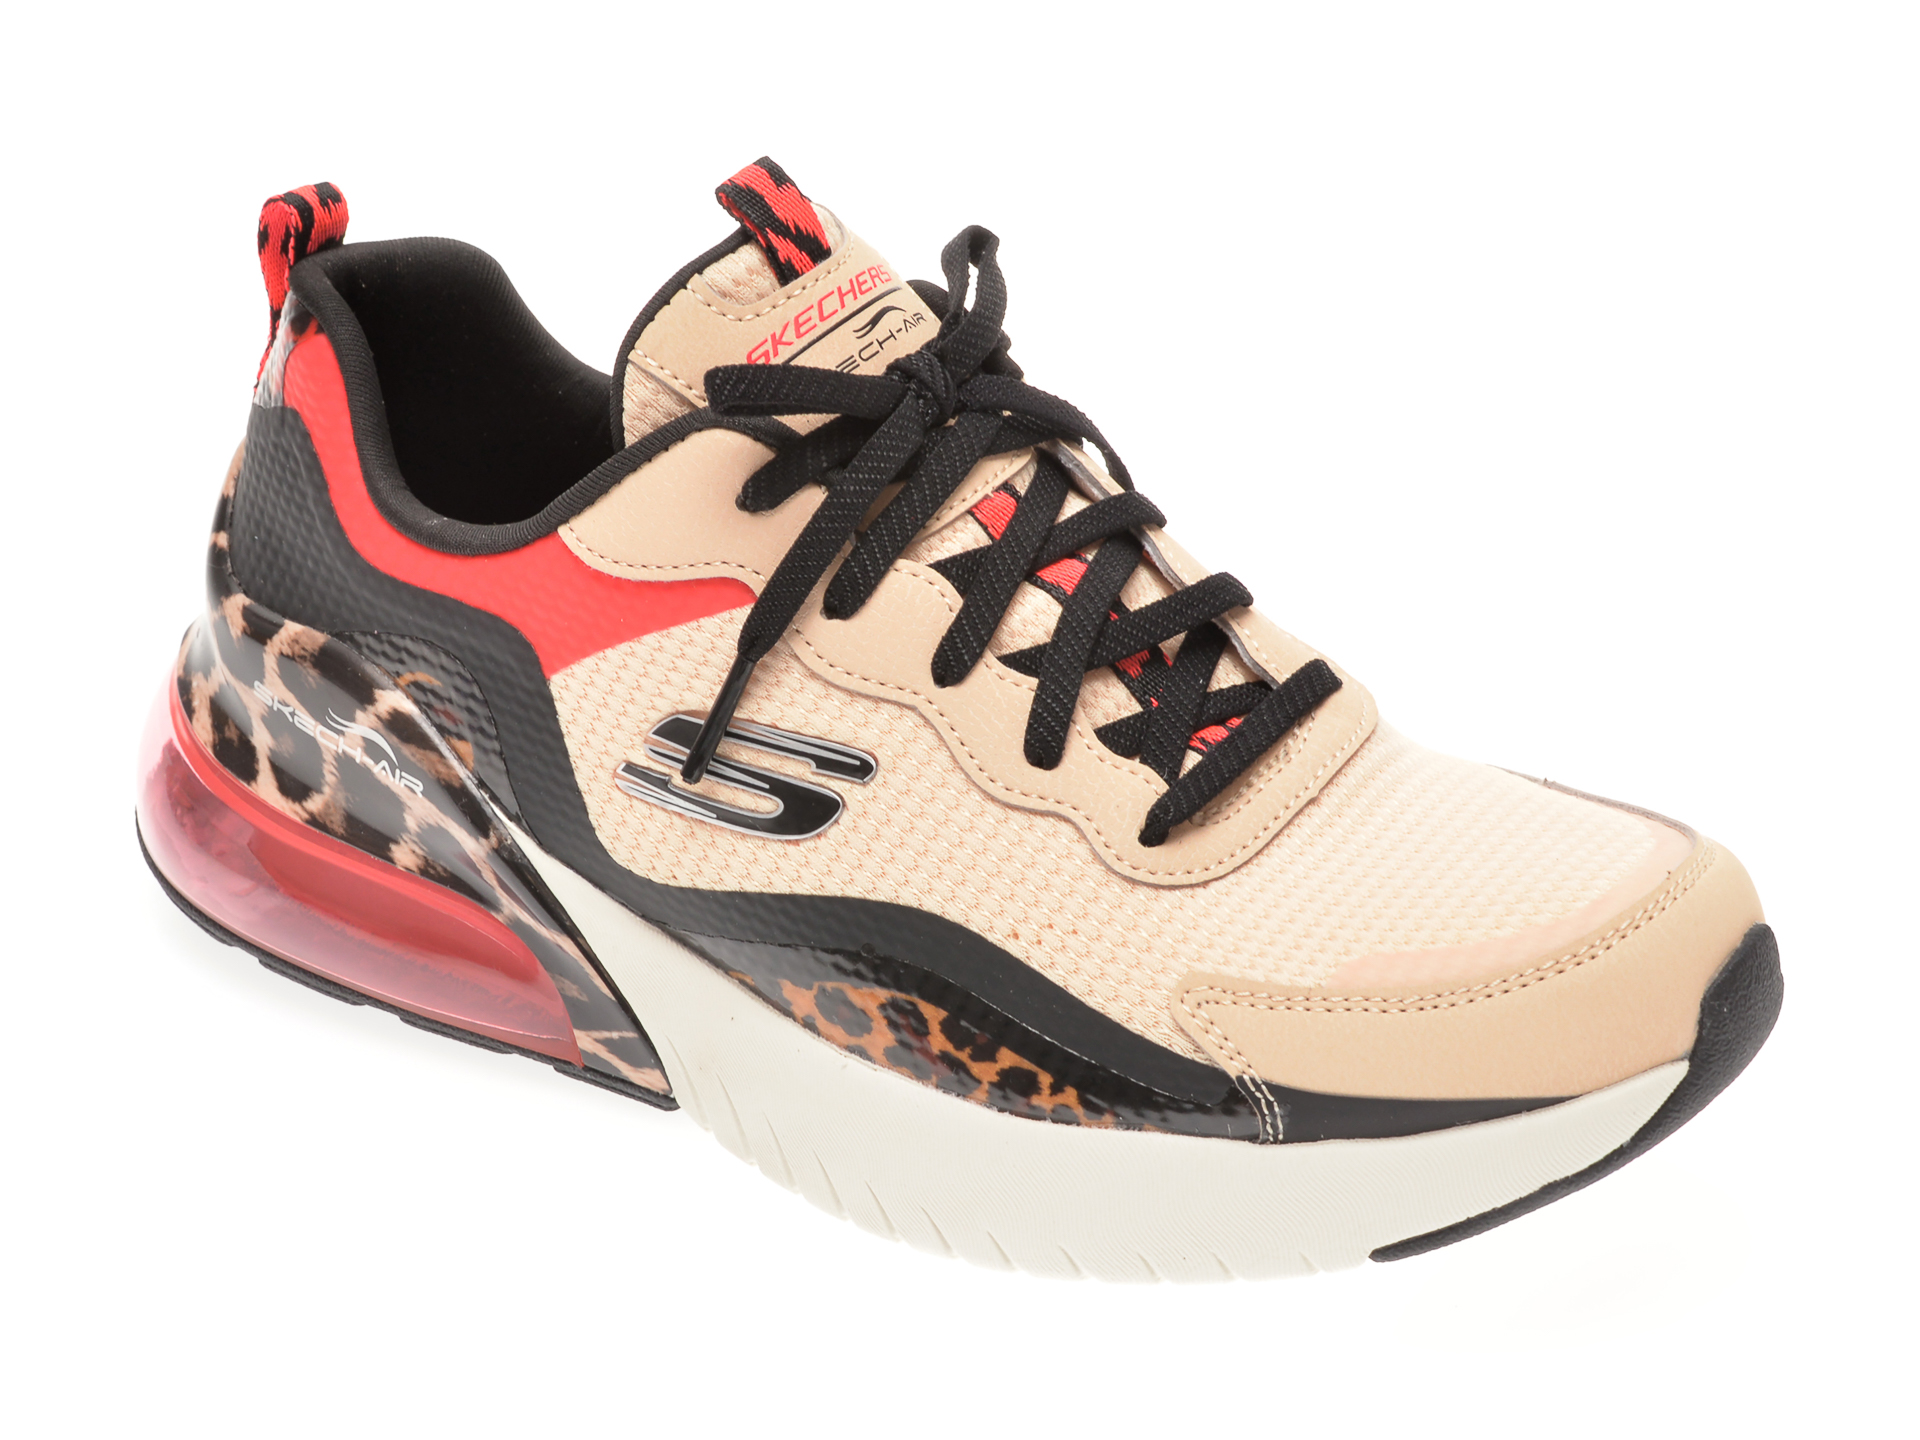 Pantofi sport SKECHERS bej, SKECH-AIR STRATUS SUPER GALAXY, din material textil si piele ecologica